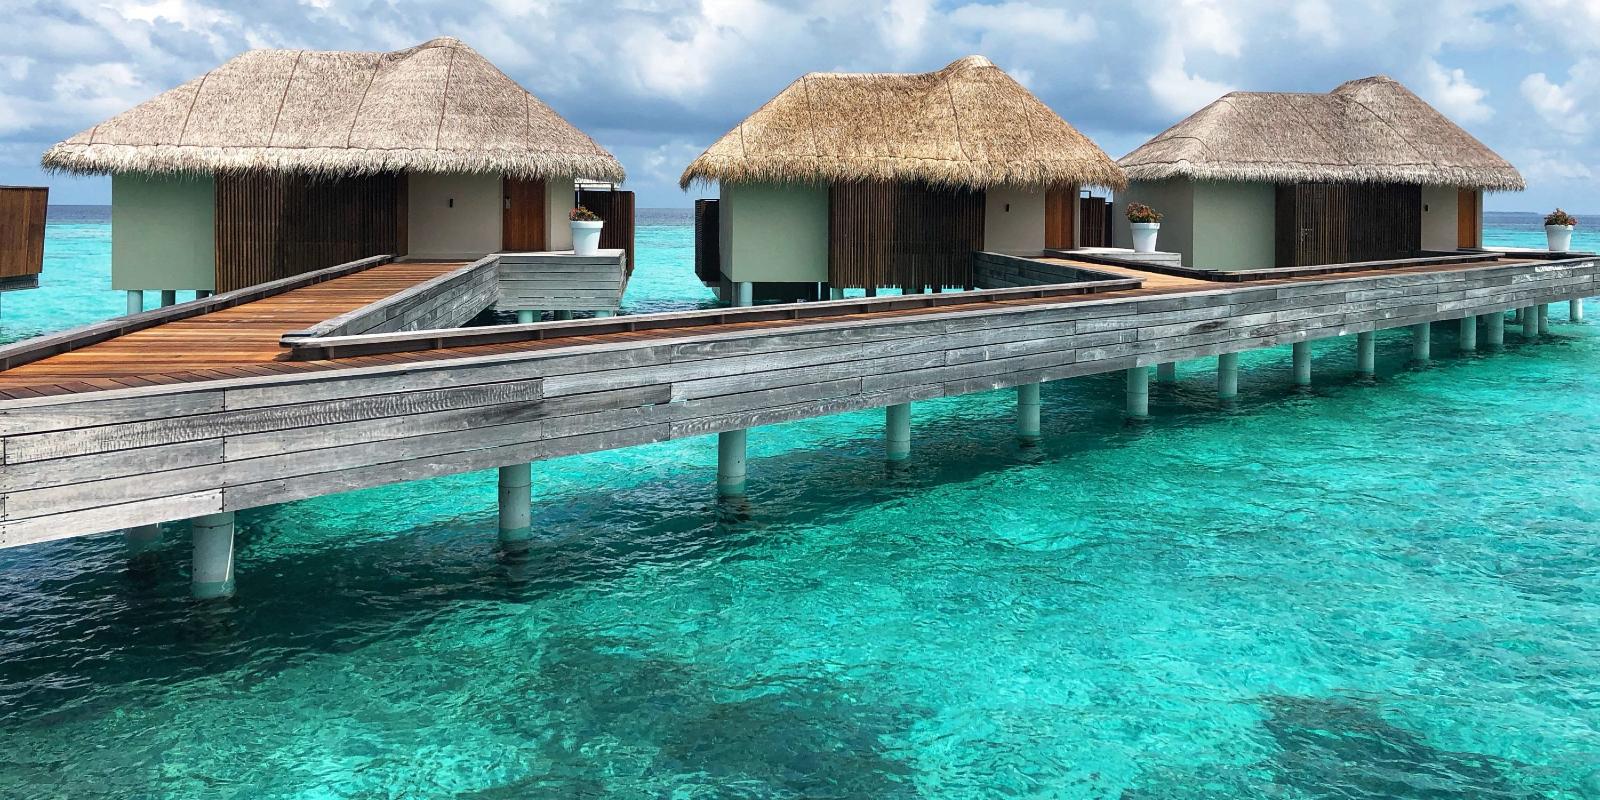 Travel blog: Beach Villa or Water Villa? Which Should you Choose